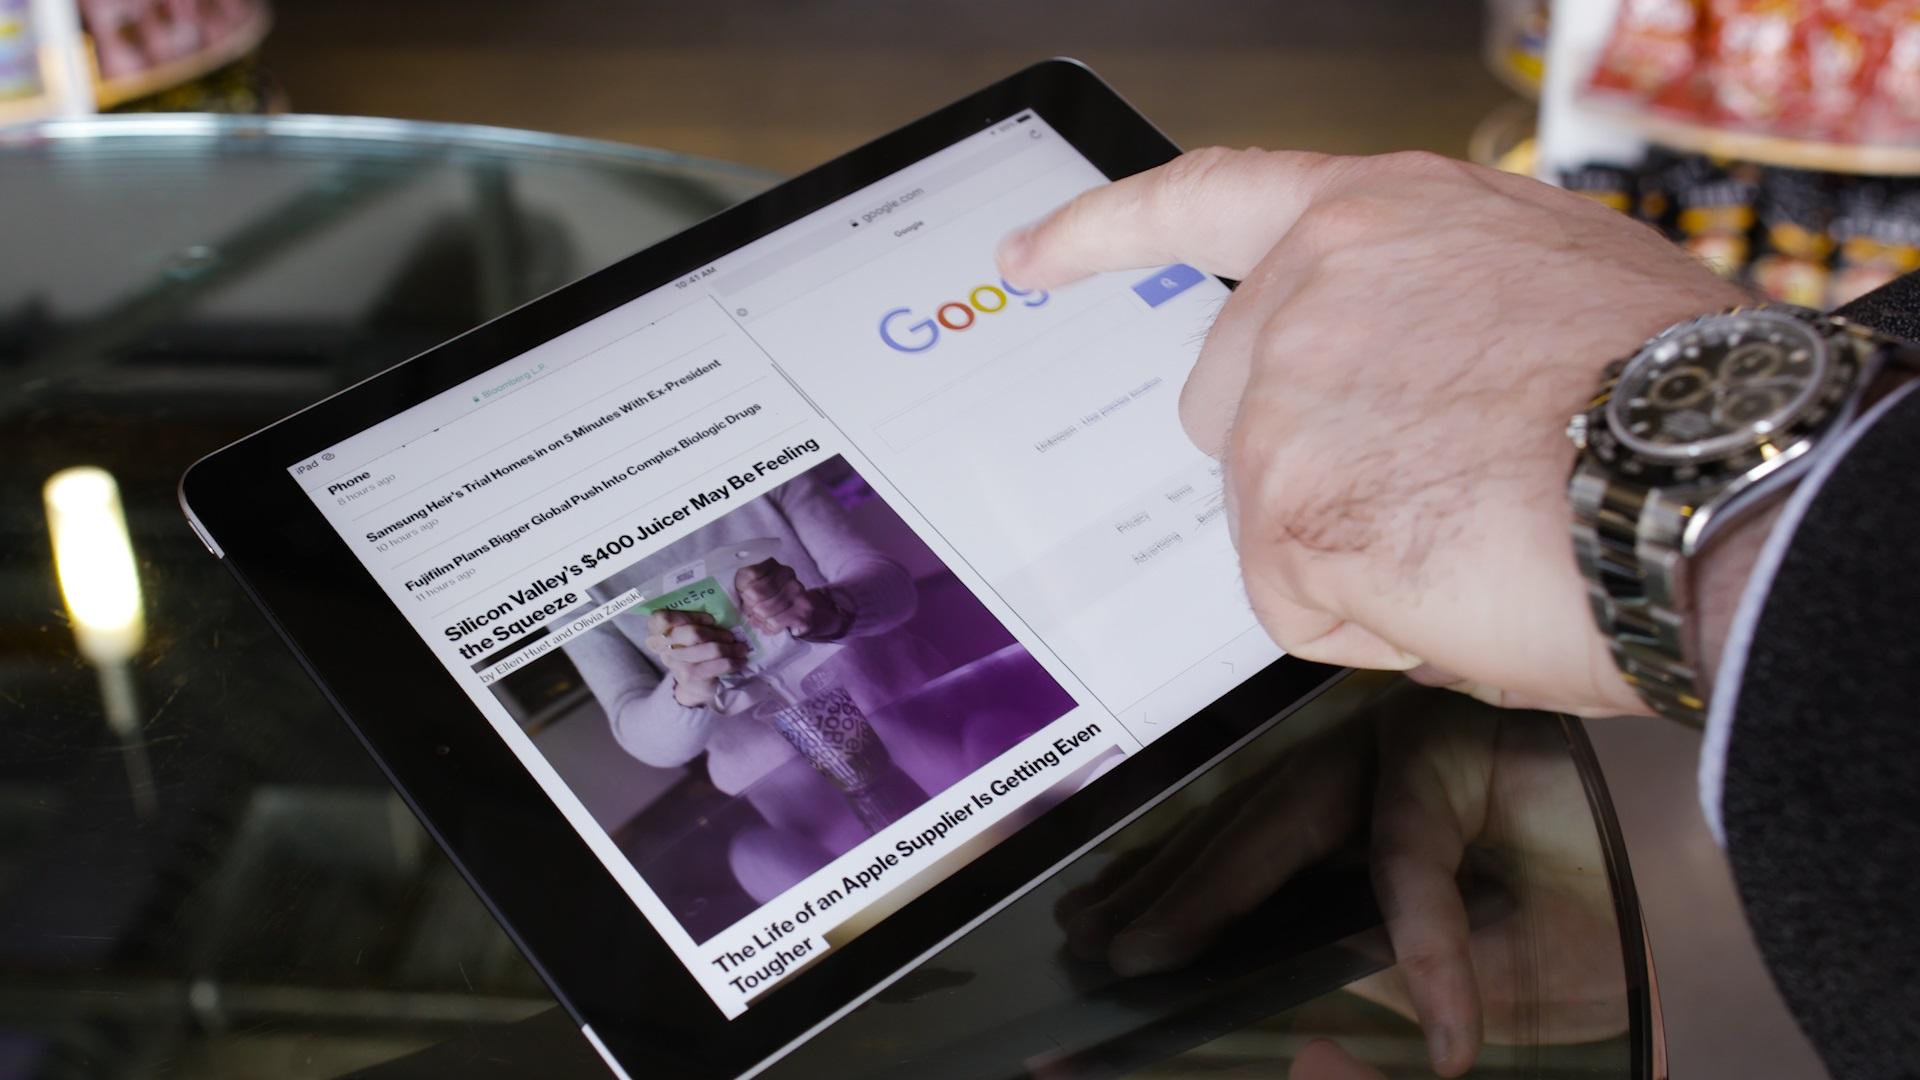 Gadgets With Gurman: Apple's Latest iPad, Buy or Wait?